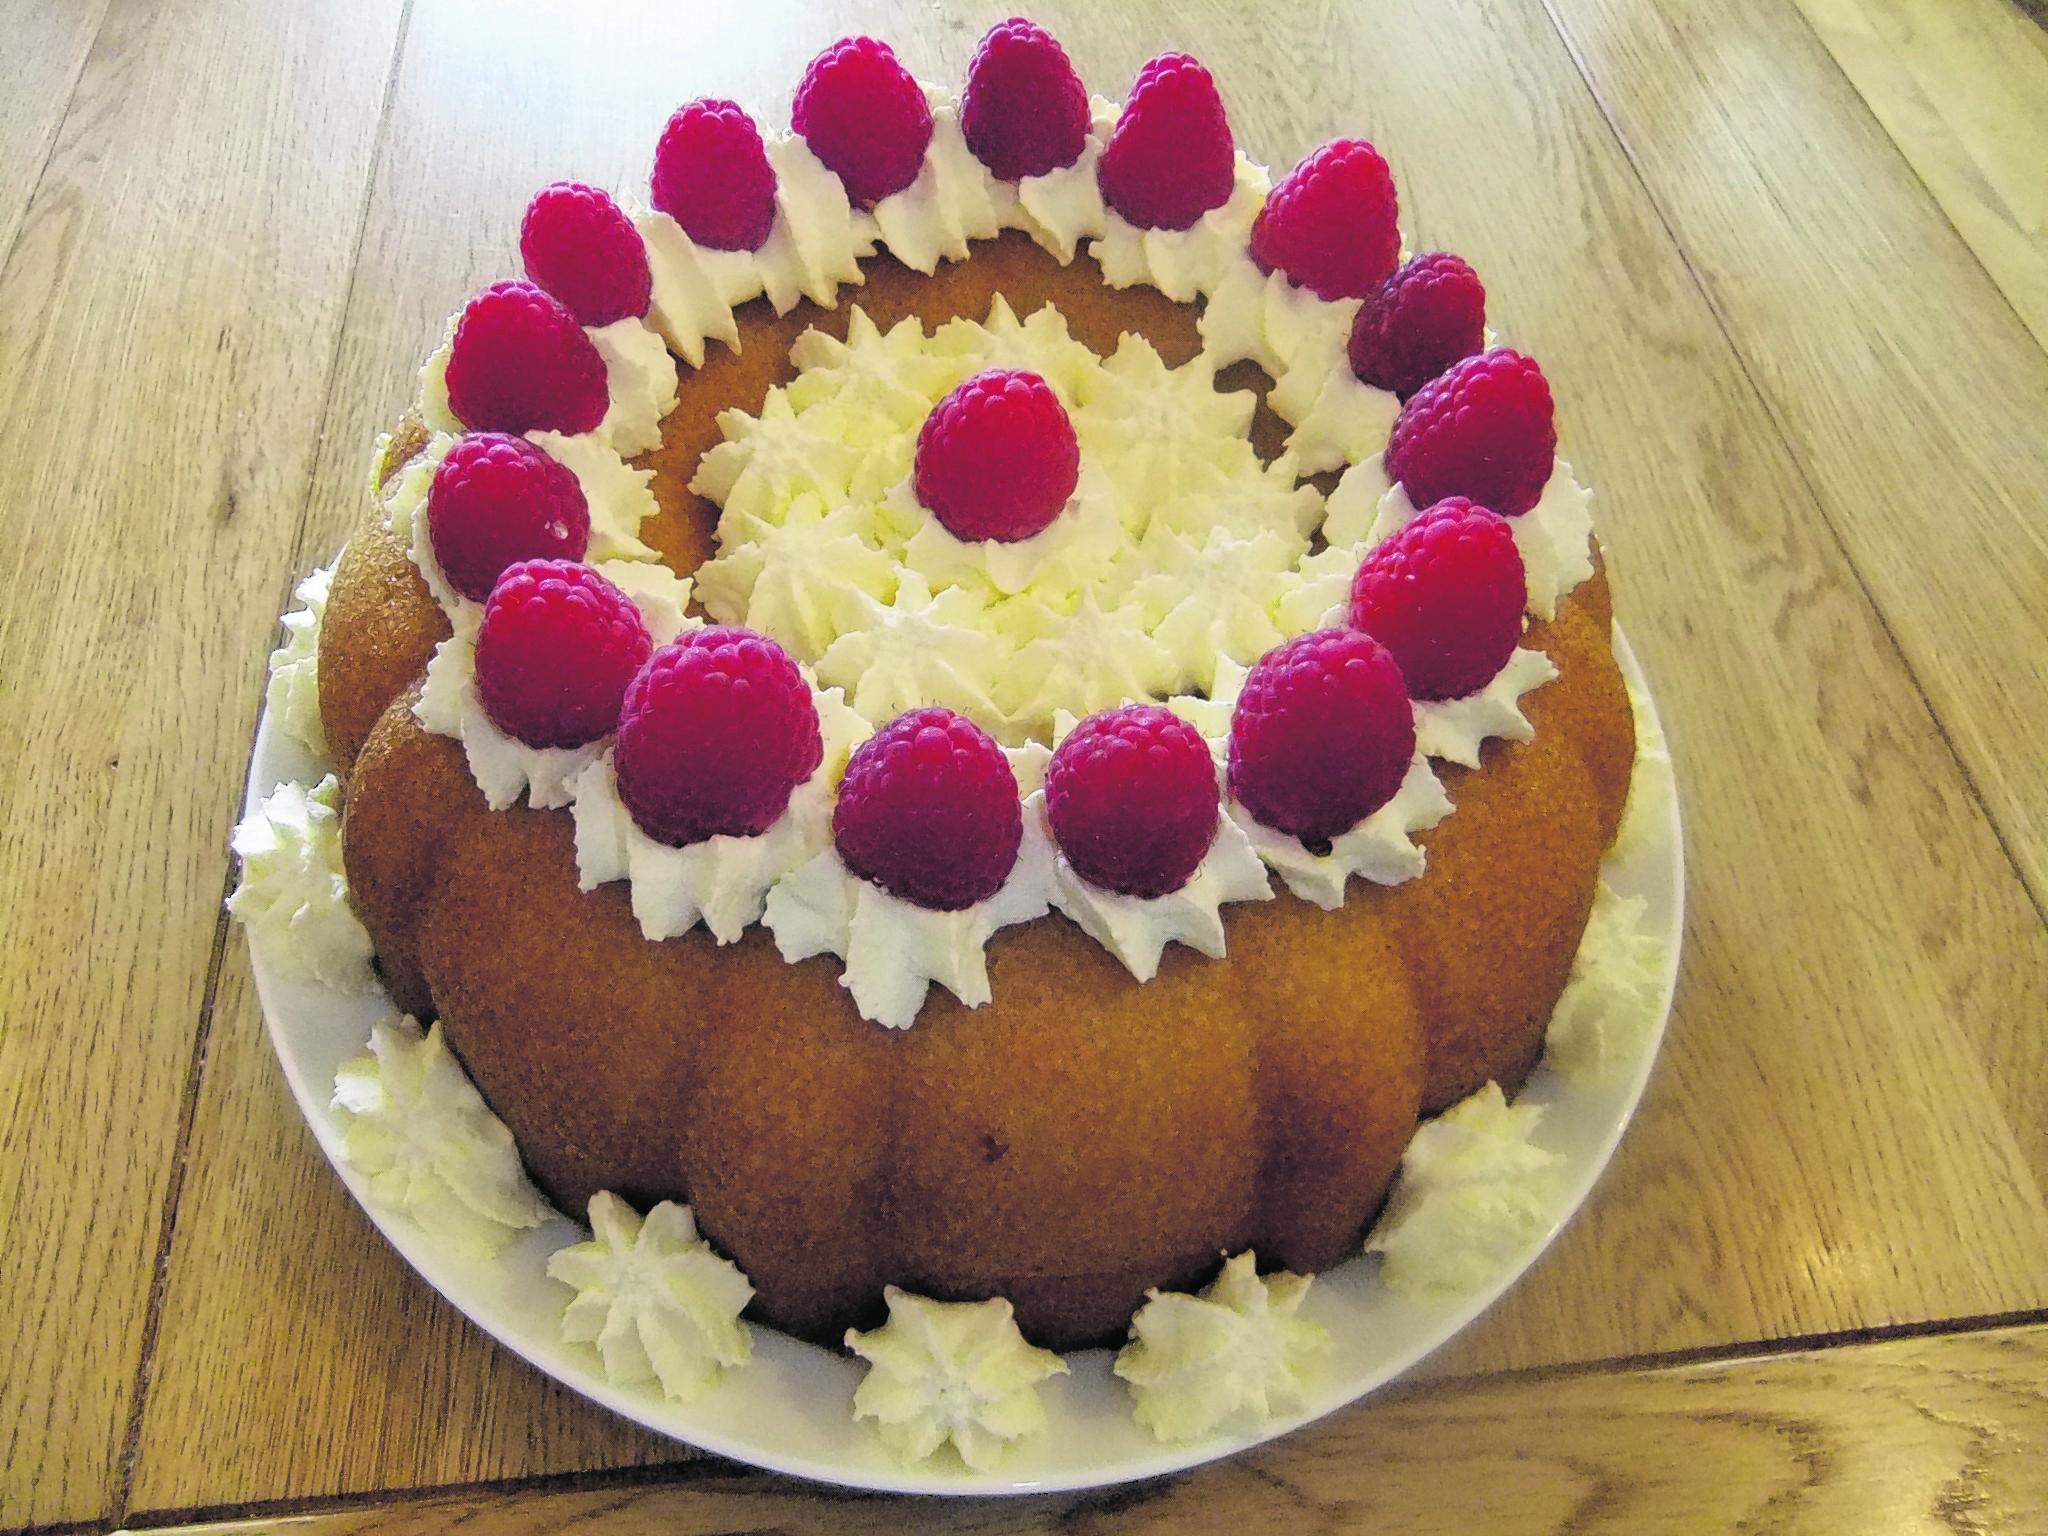 Norman Calder's savarin cake